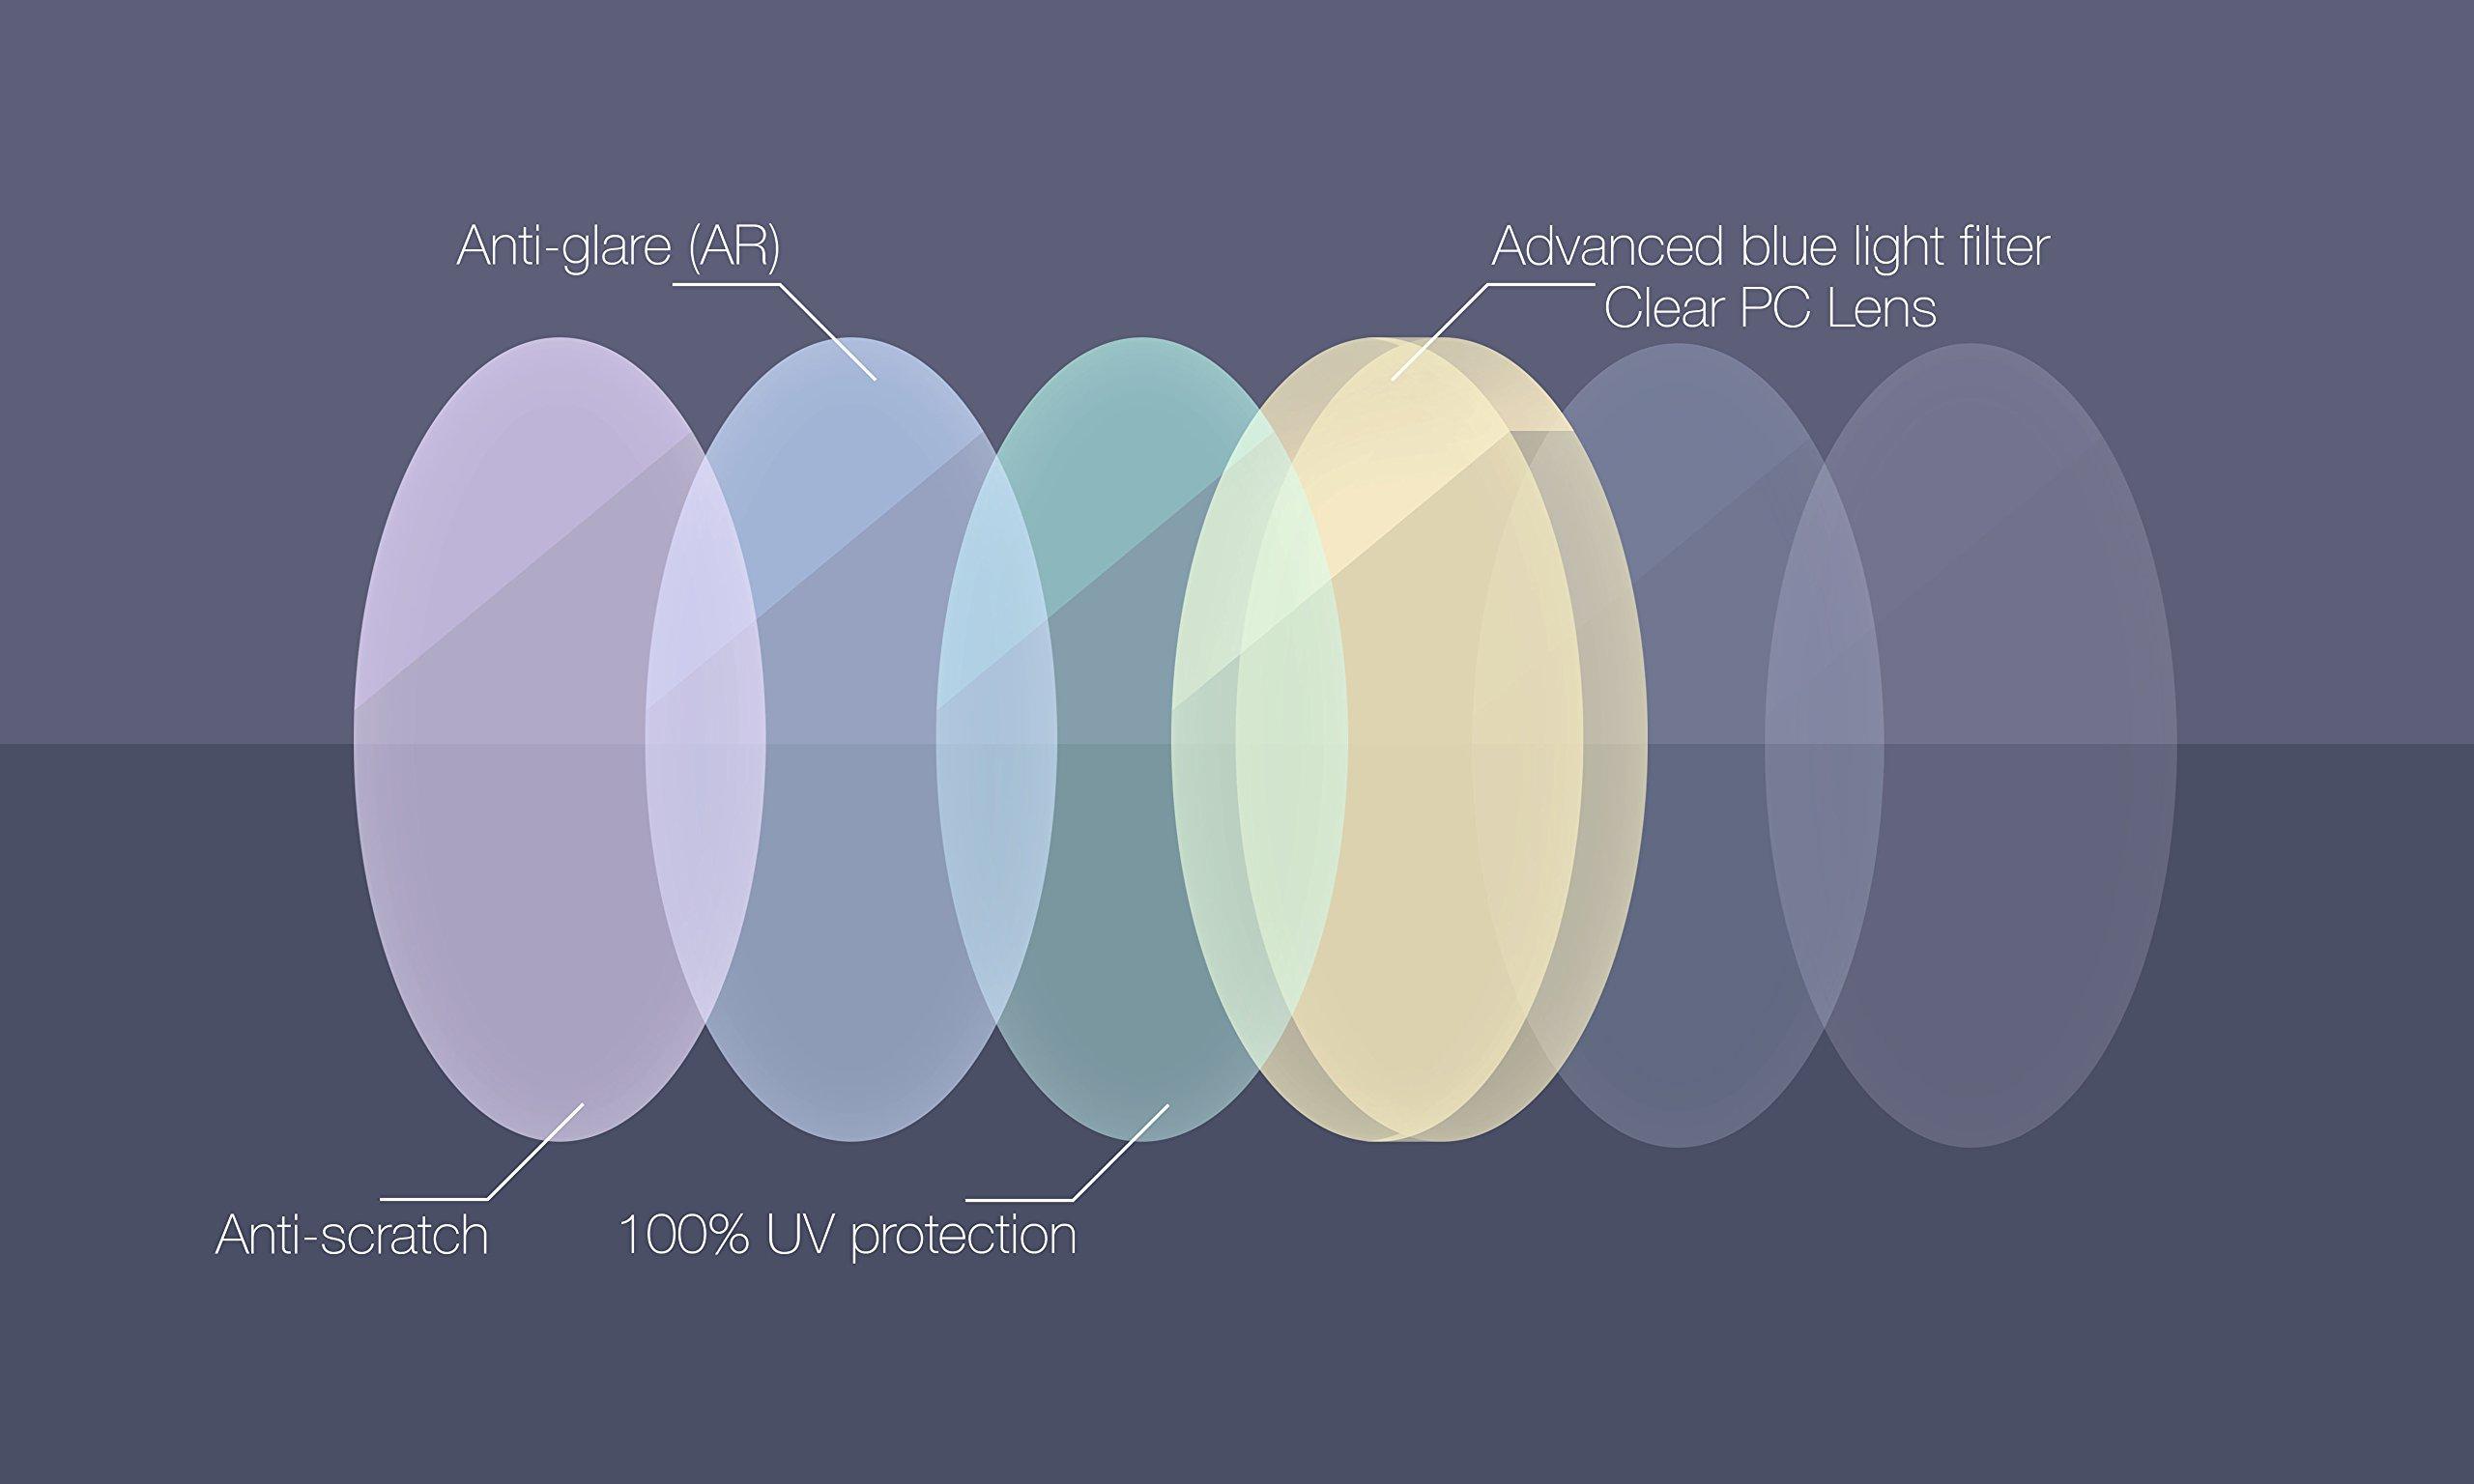 Pixel Eyewear Designer Computer Glasses with Anti-Blue Light Tint UV Protection, Anti-Glare, Full Rim, Acetate Frame Black Color - Buteo Style by Pixel Eyewear (Image #5)